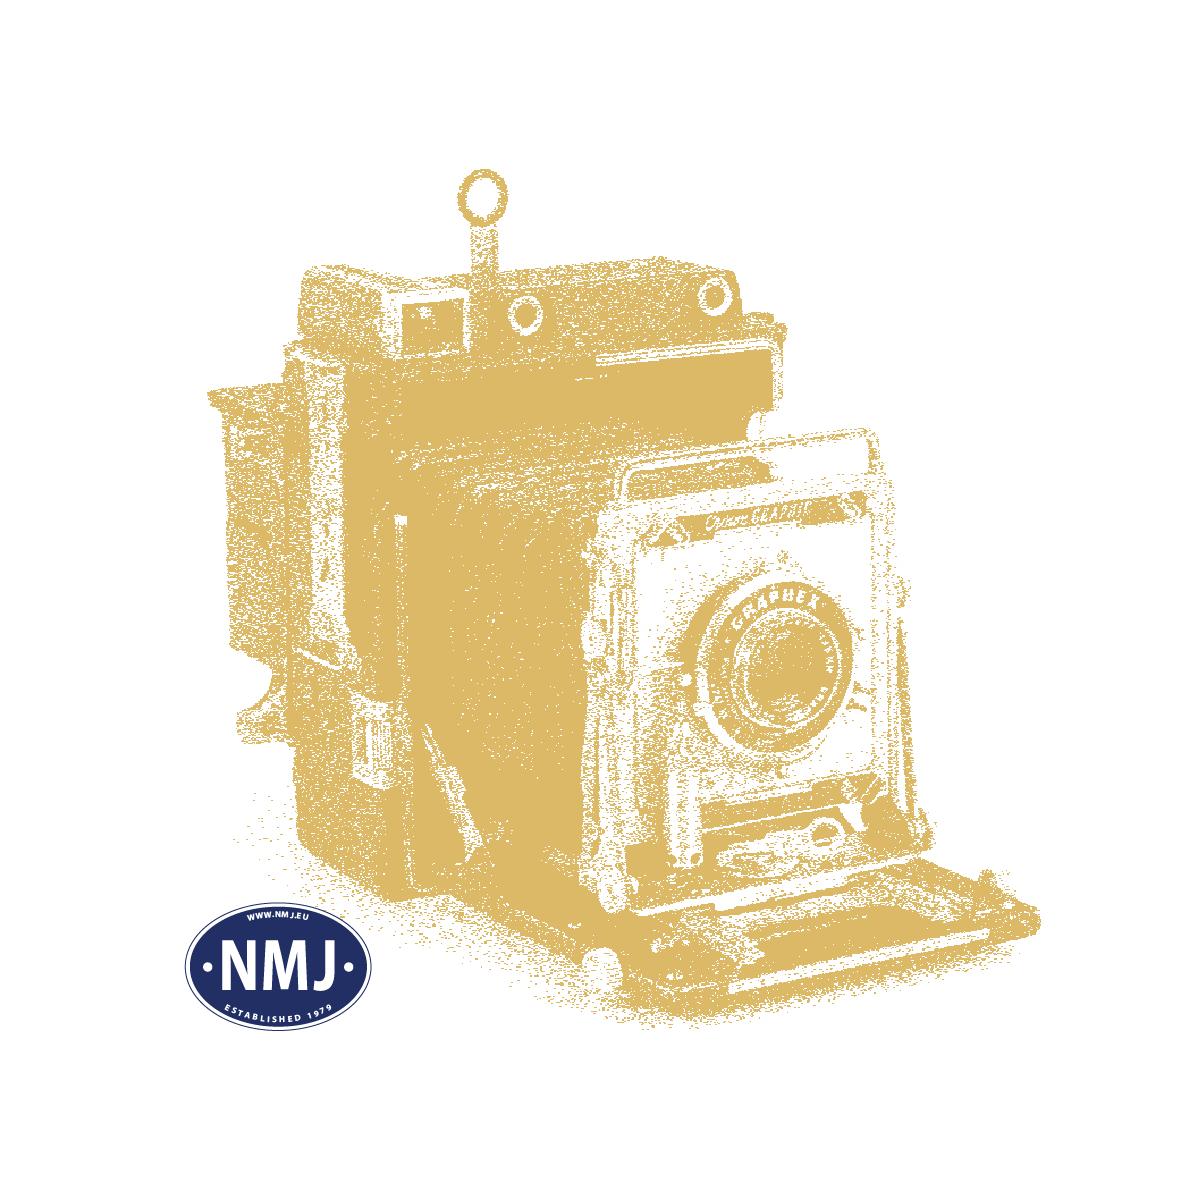 NMJSCM18246 - NMJ Superline NSB Cm 18246, DCC Digital